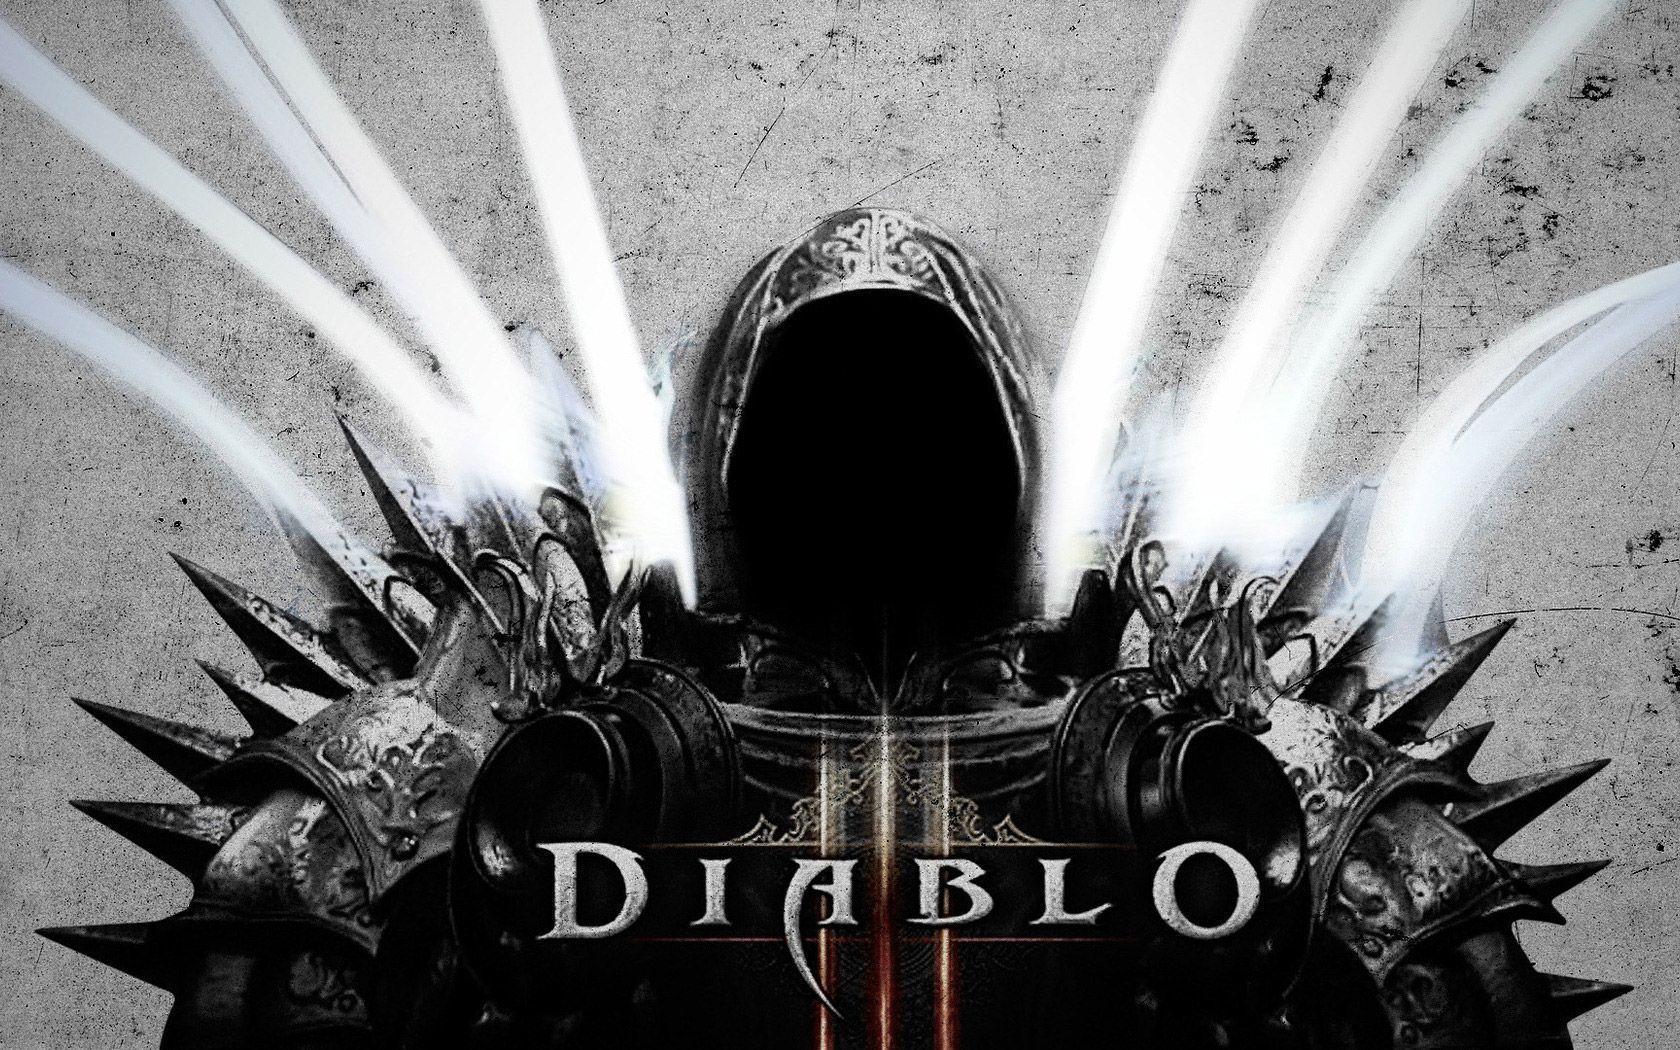 Diablo 3 wallpapers | Diablo 3 background - Page 13